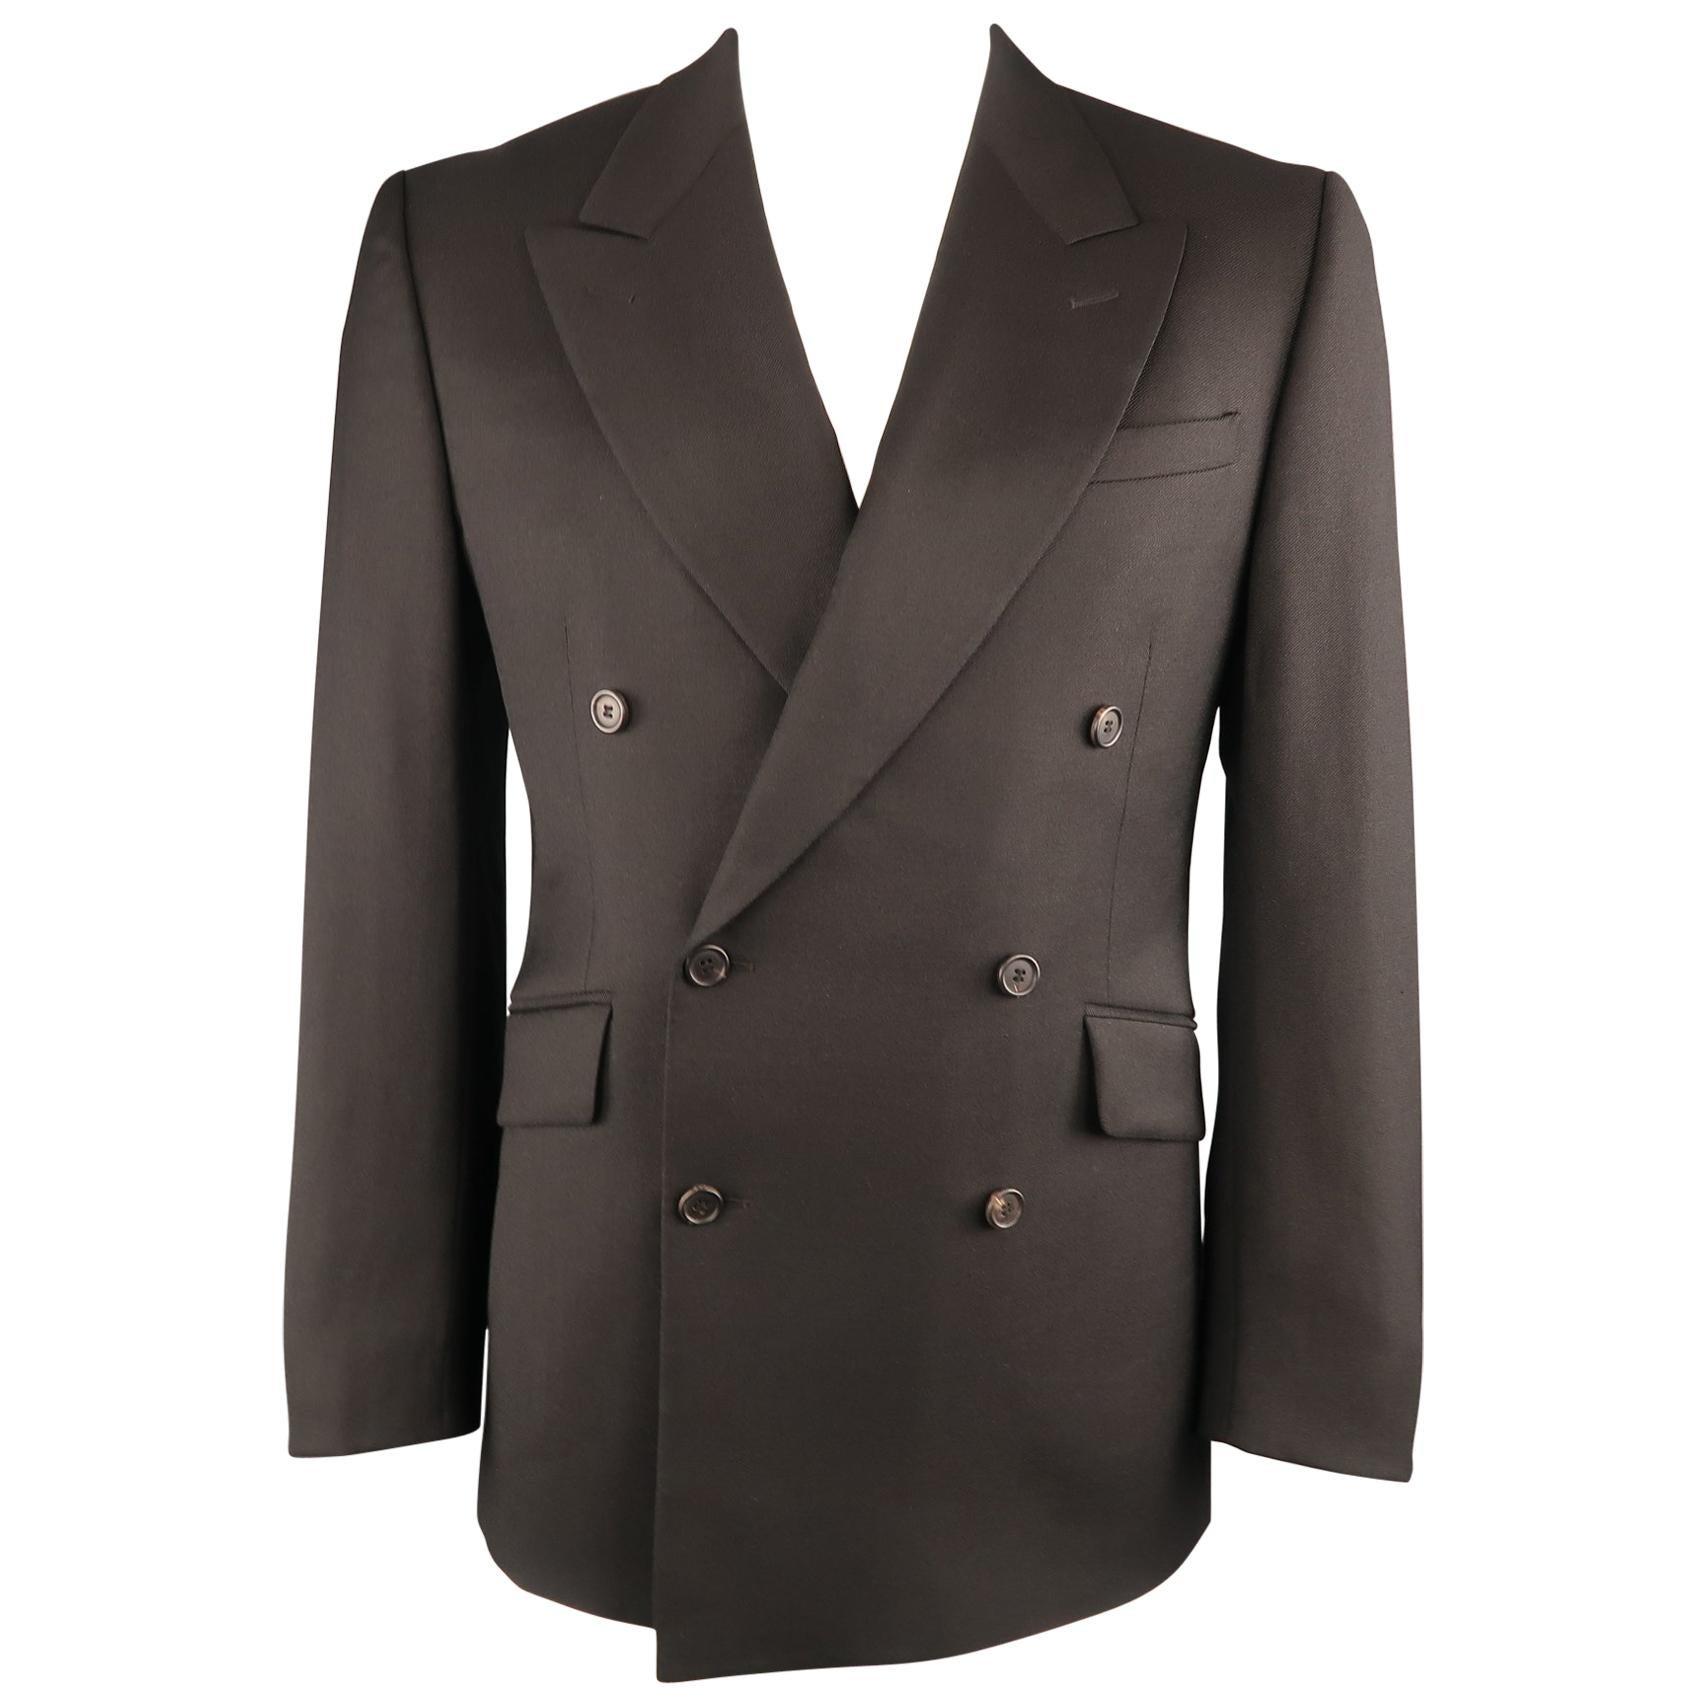 PRADA 42 Black Solid Wool / Mohair Twill Peak Lapel Double Breasted Sport Coat